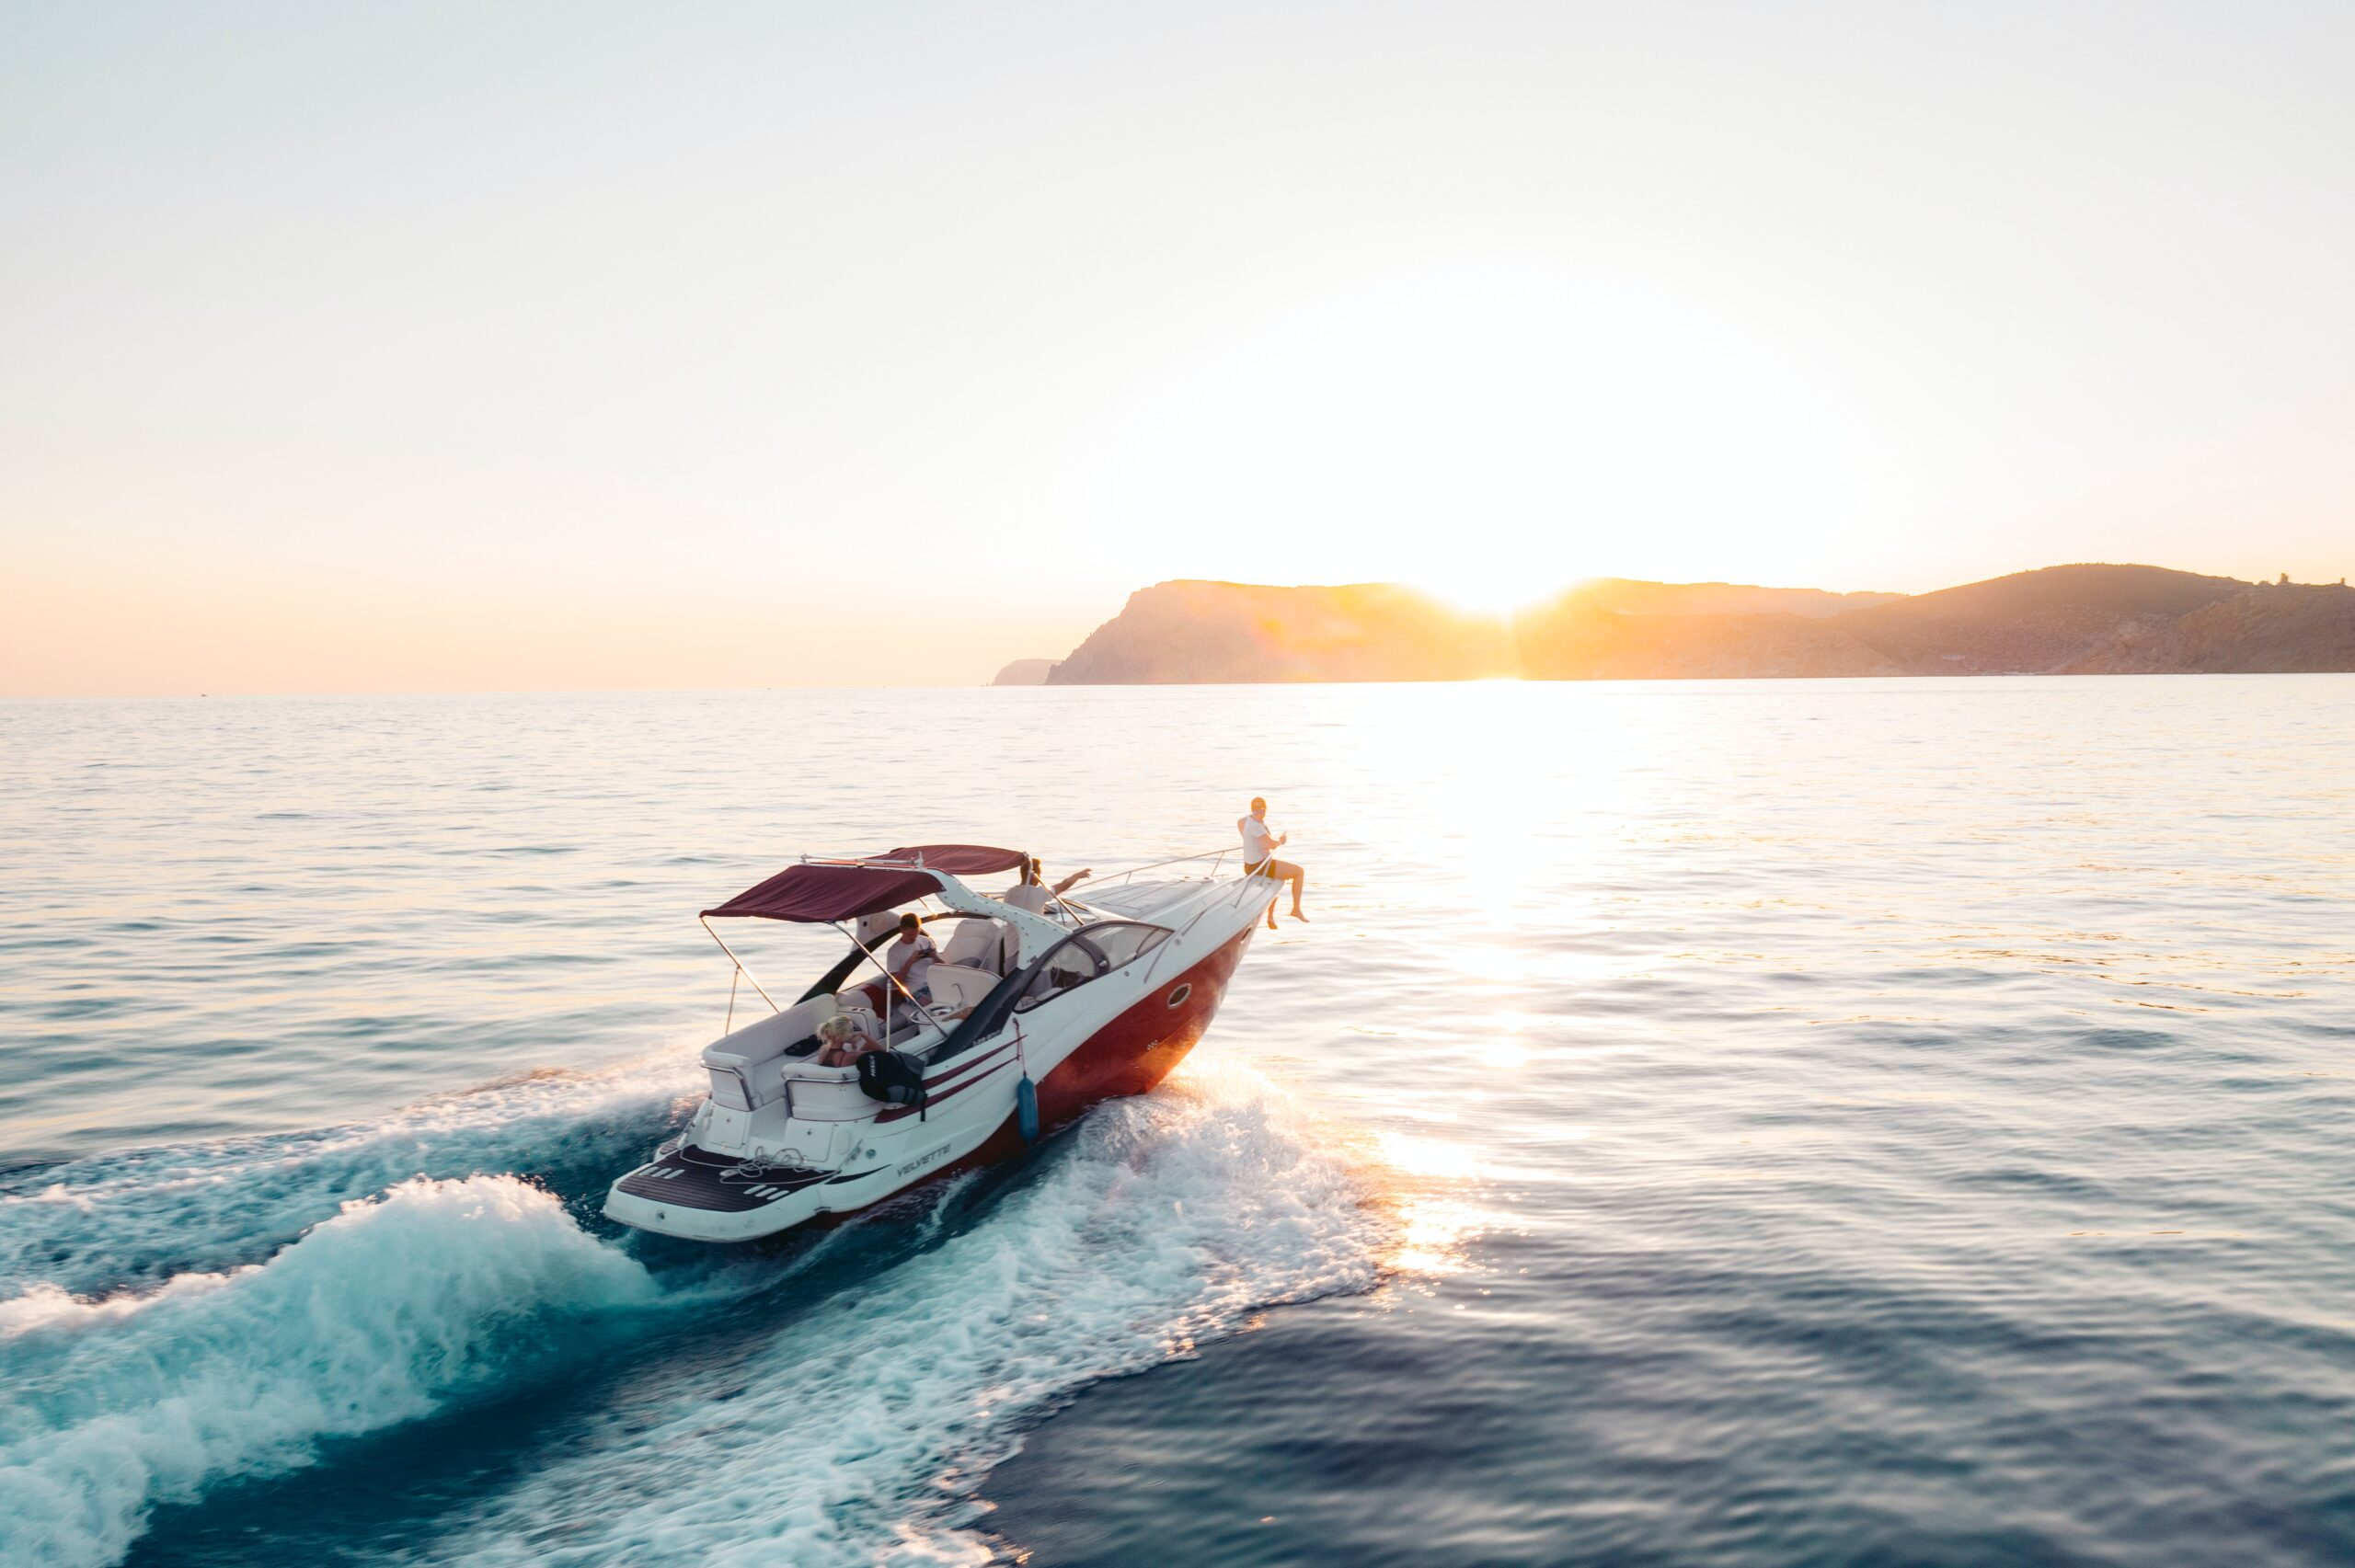 Cobertura de seguros para empresas náuticas:Capitales Responsabilidad Civil Obligatoria